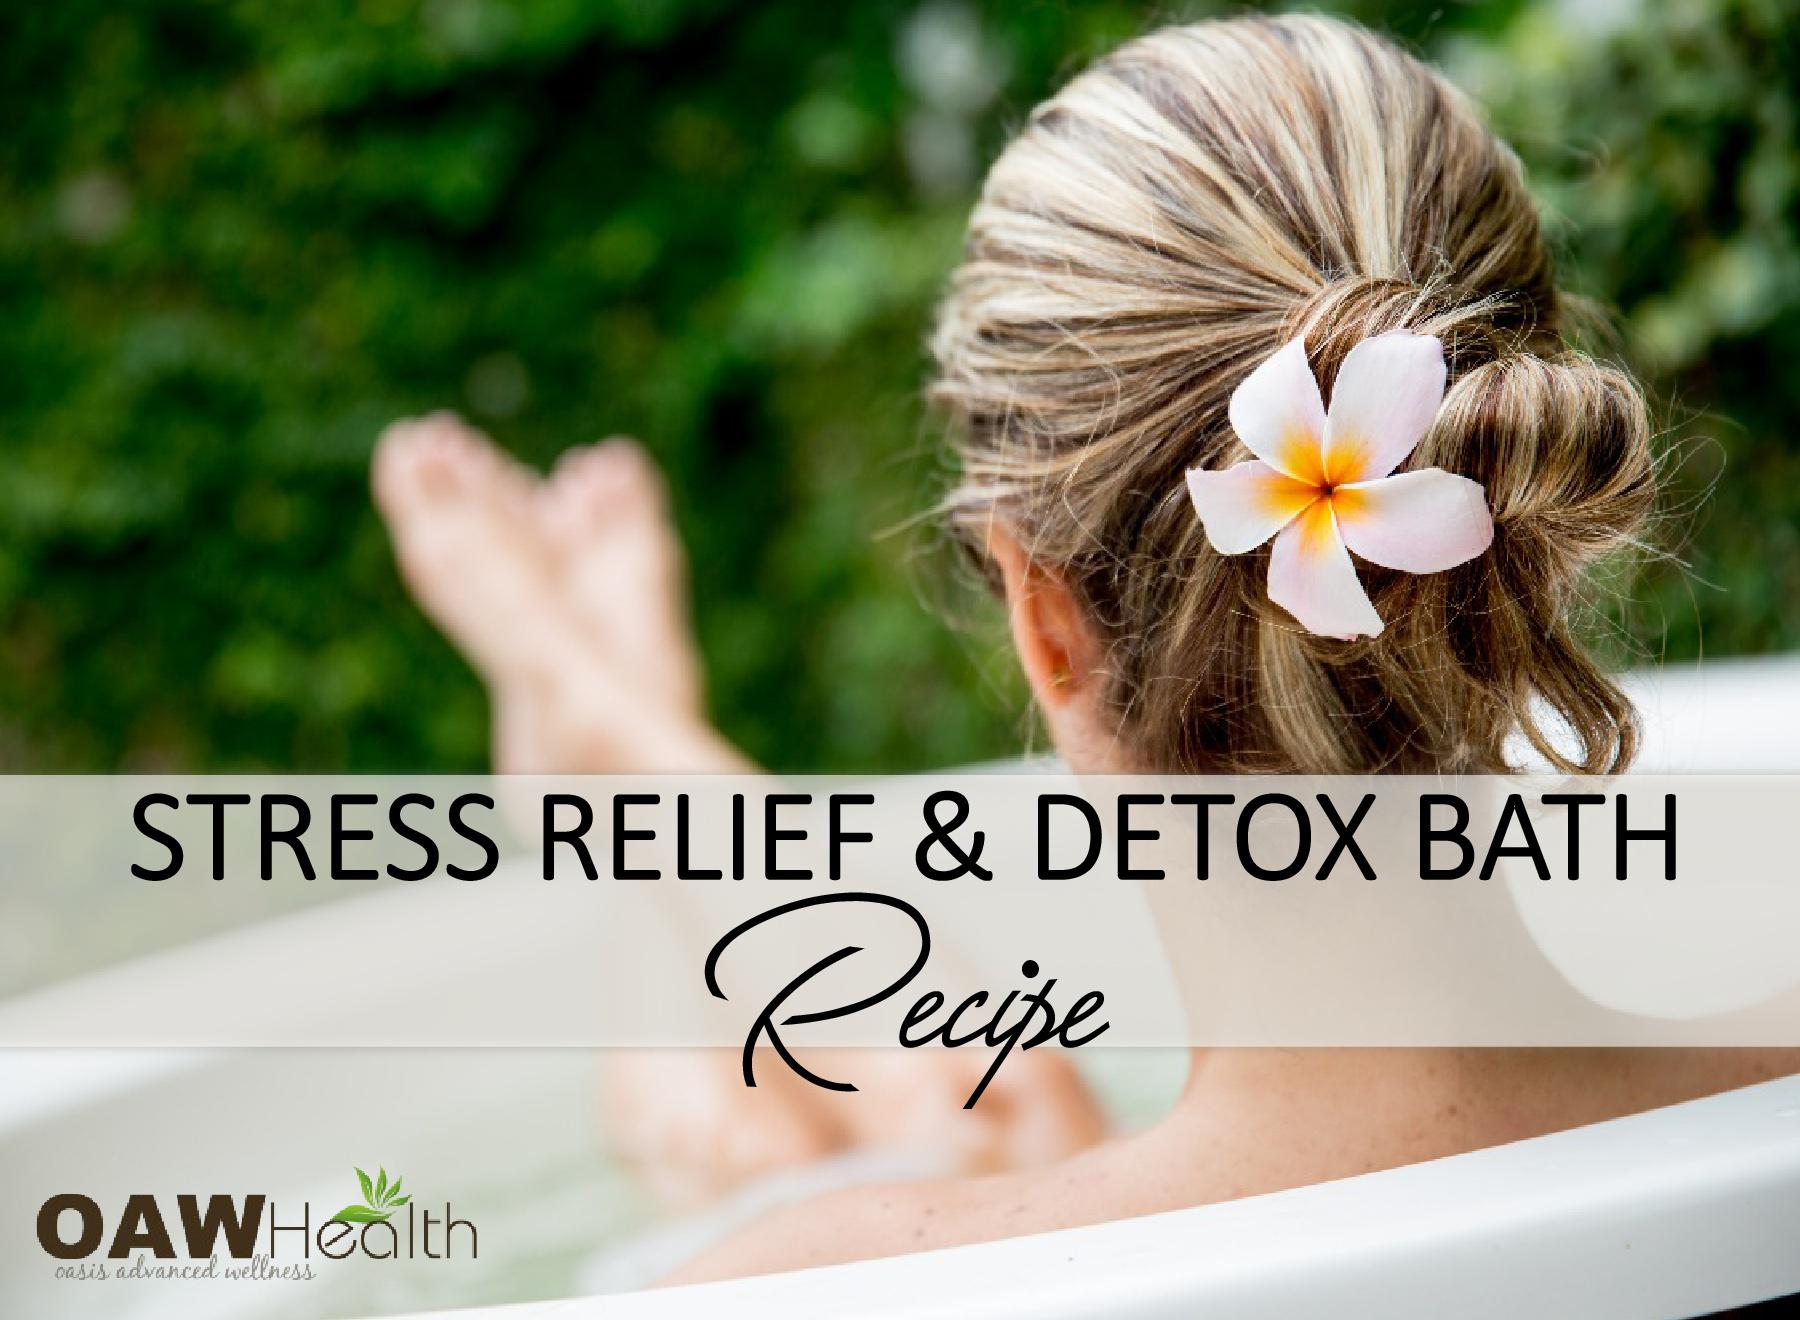 DIY Stress Relief & Detox Bath Recipe